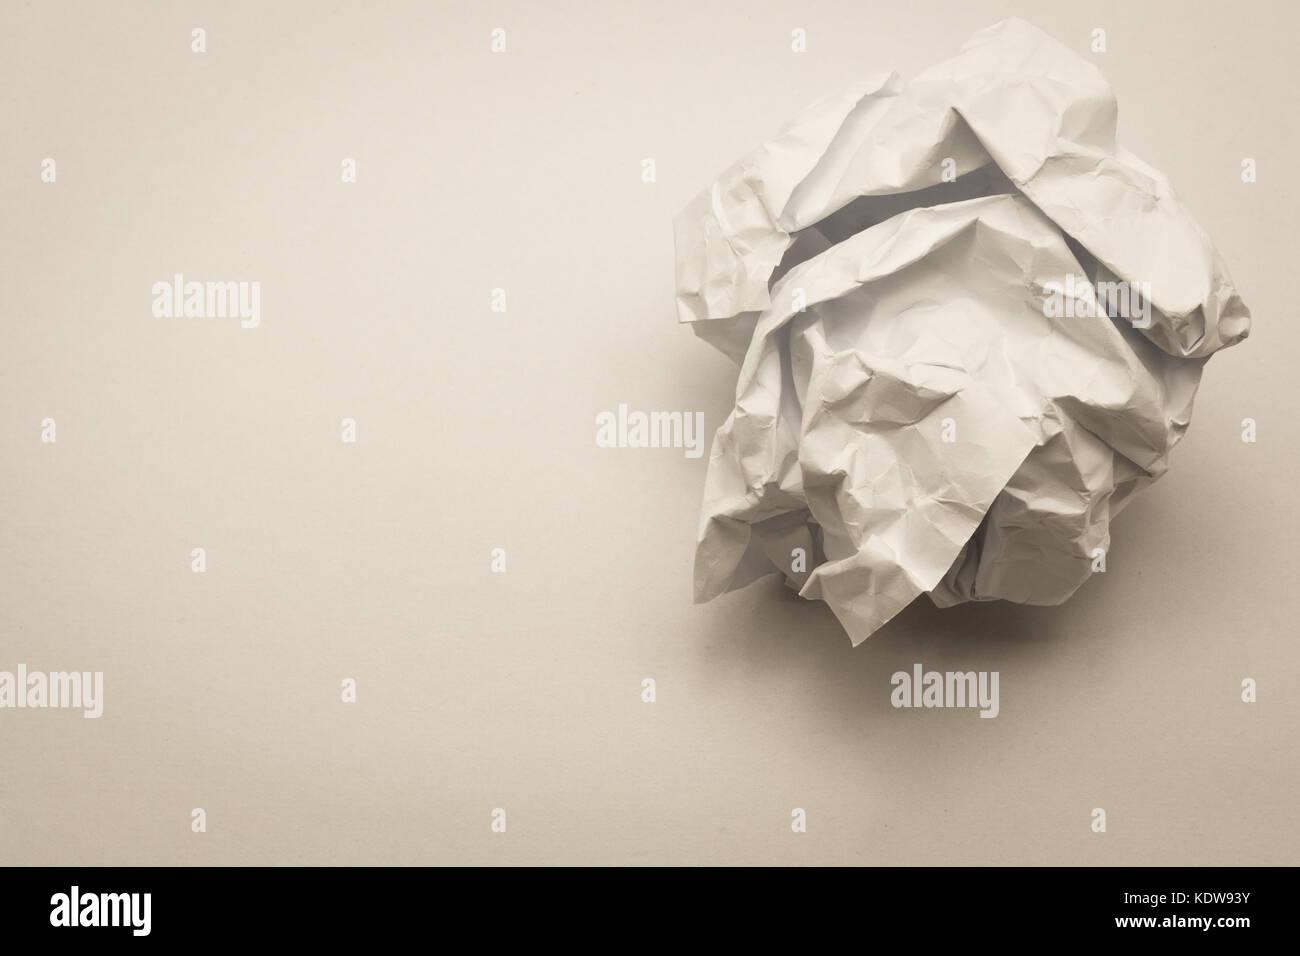 close up of crumpled paper ball stock photos & close up of crumpled